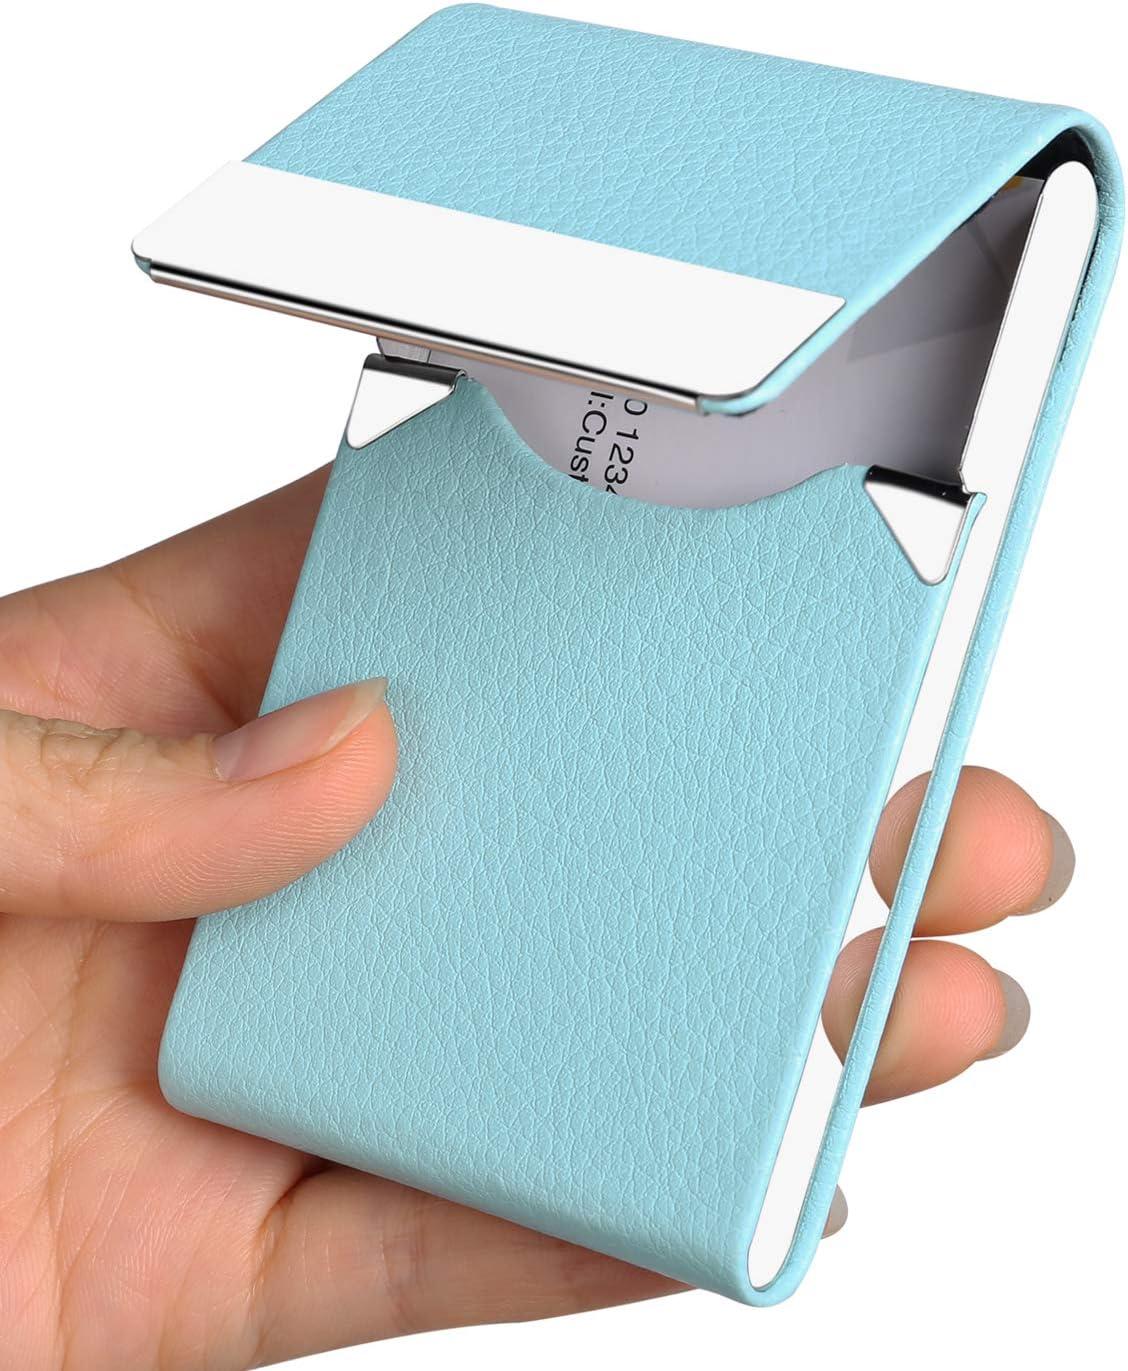 Business Card Holder Case - JuneLsy Professional PU Leather Business Card Case Metal Name Card Holder Pocket Business Card Carrier for Men & Women with Magnetic Shut (Light Blue-y)